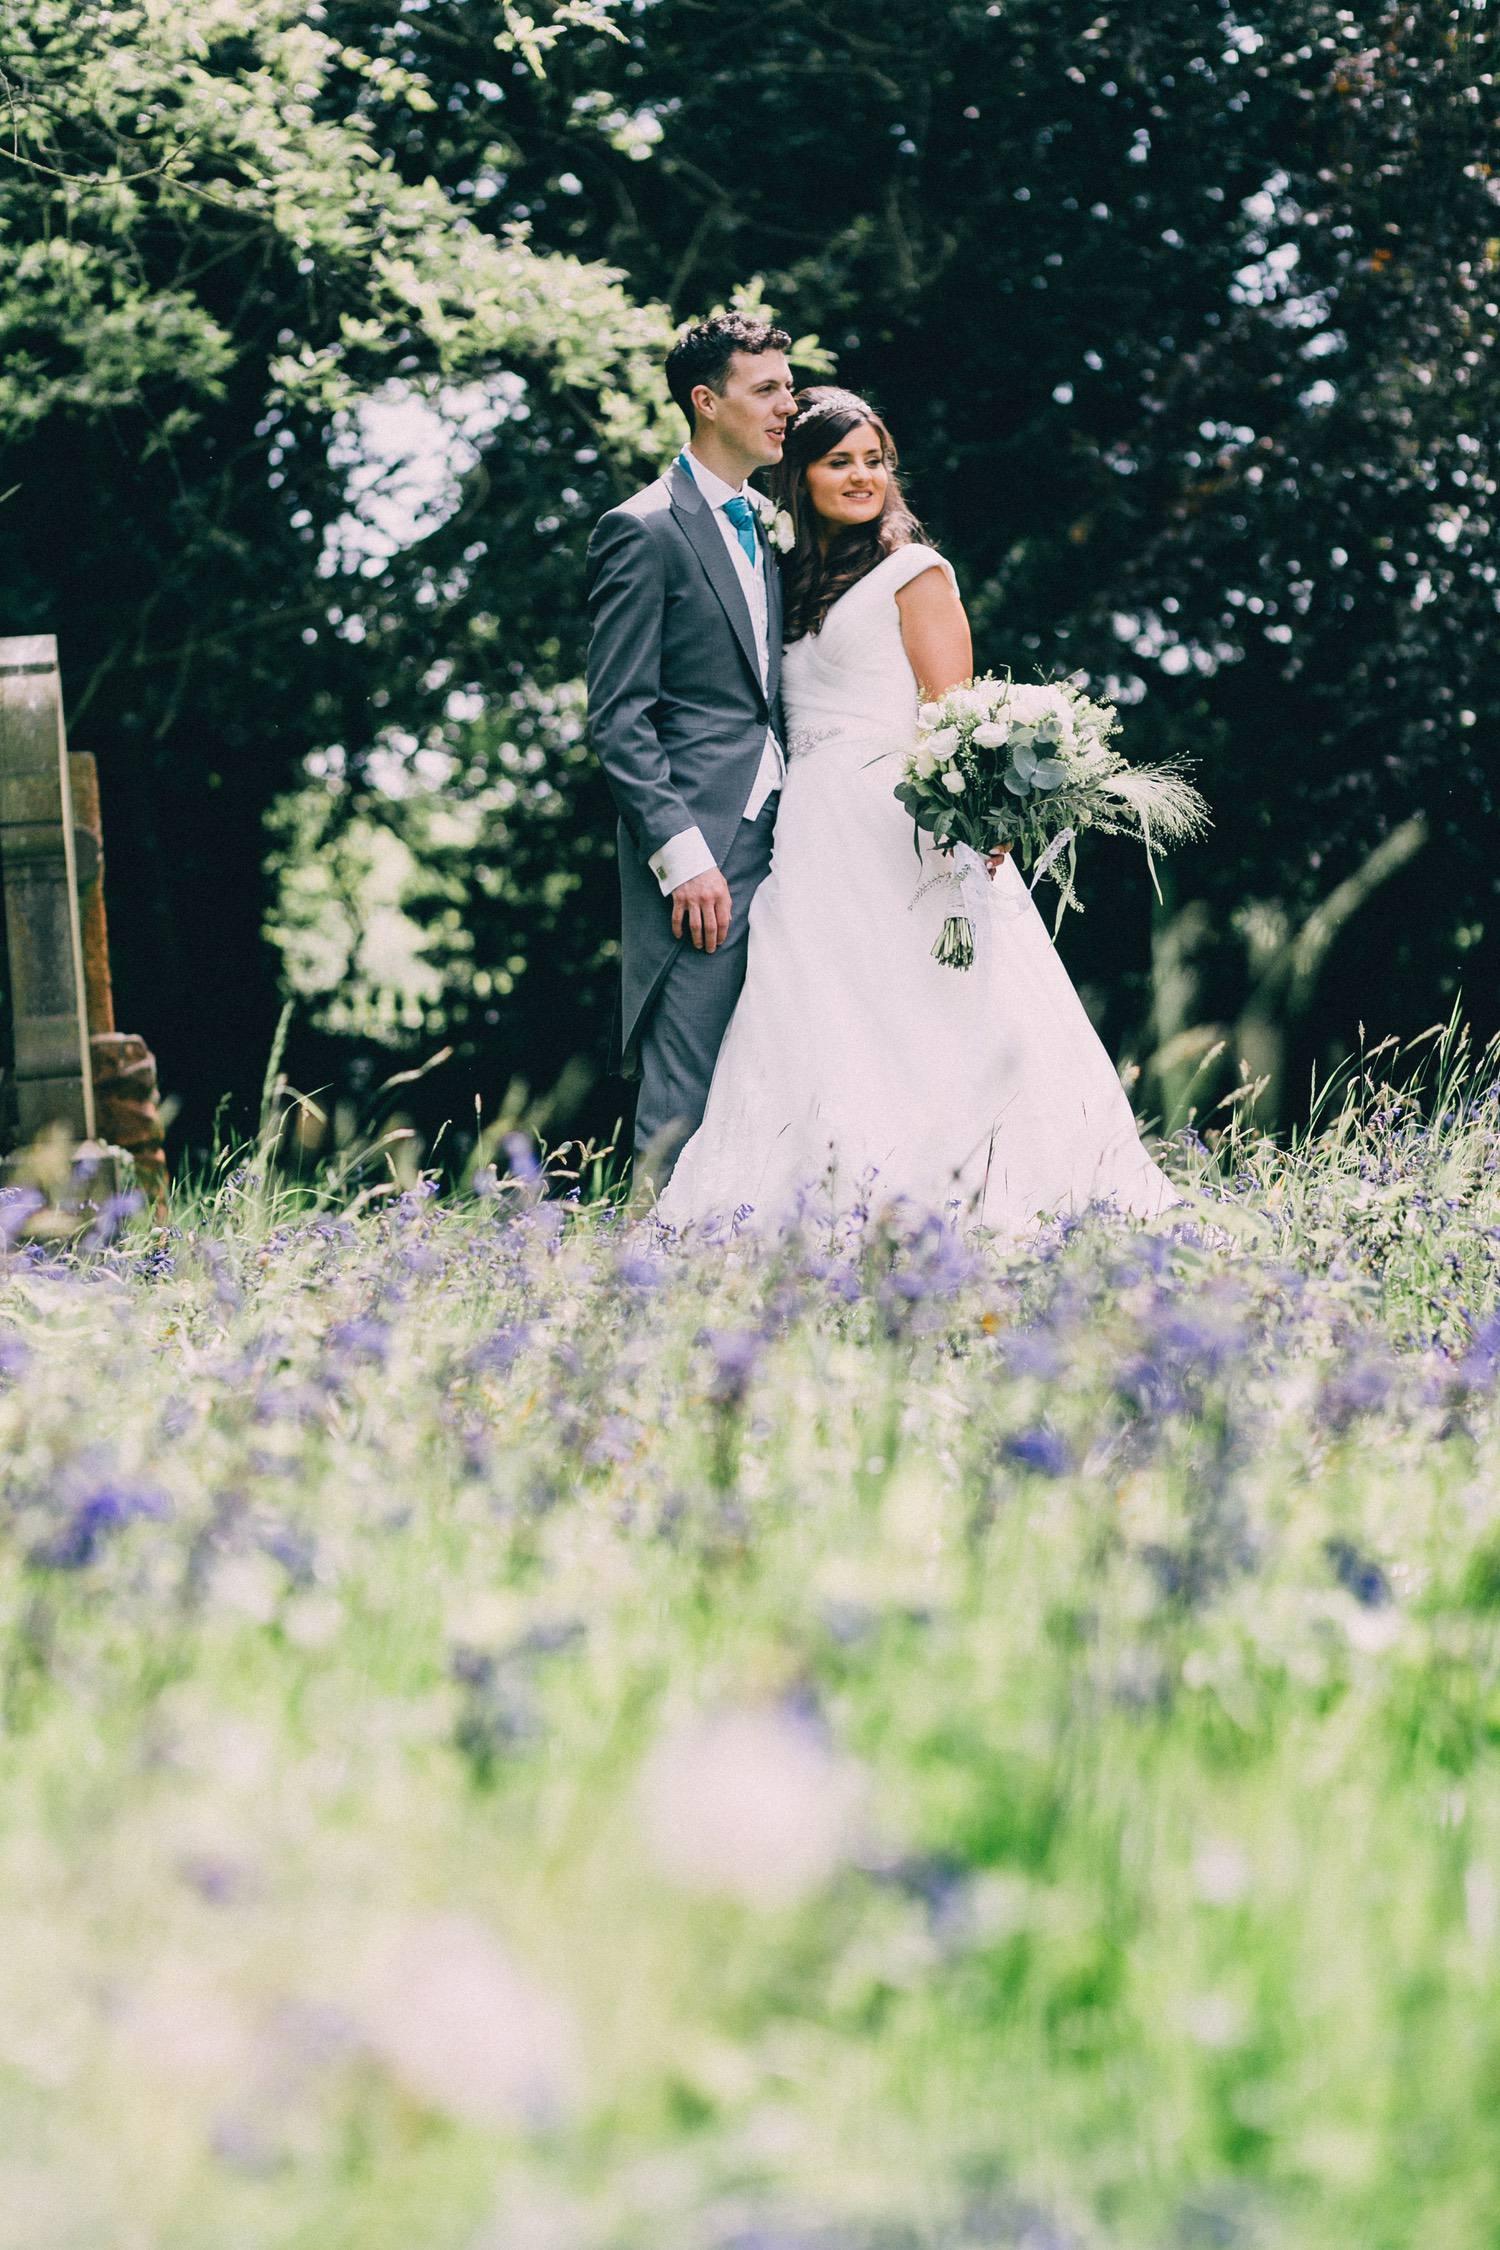 Brancepeth-Castle-Wedding-Photos-15.jpg